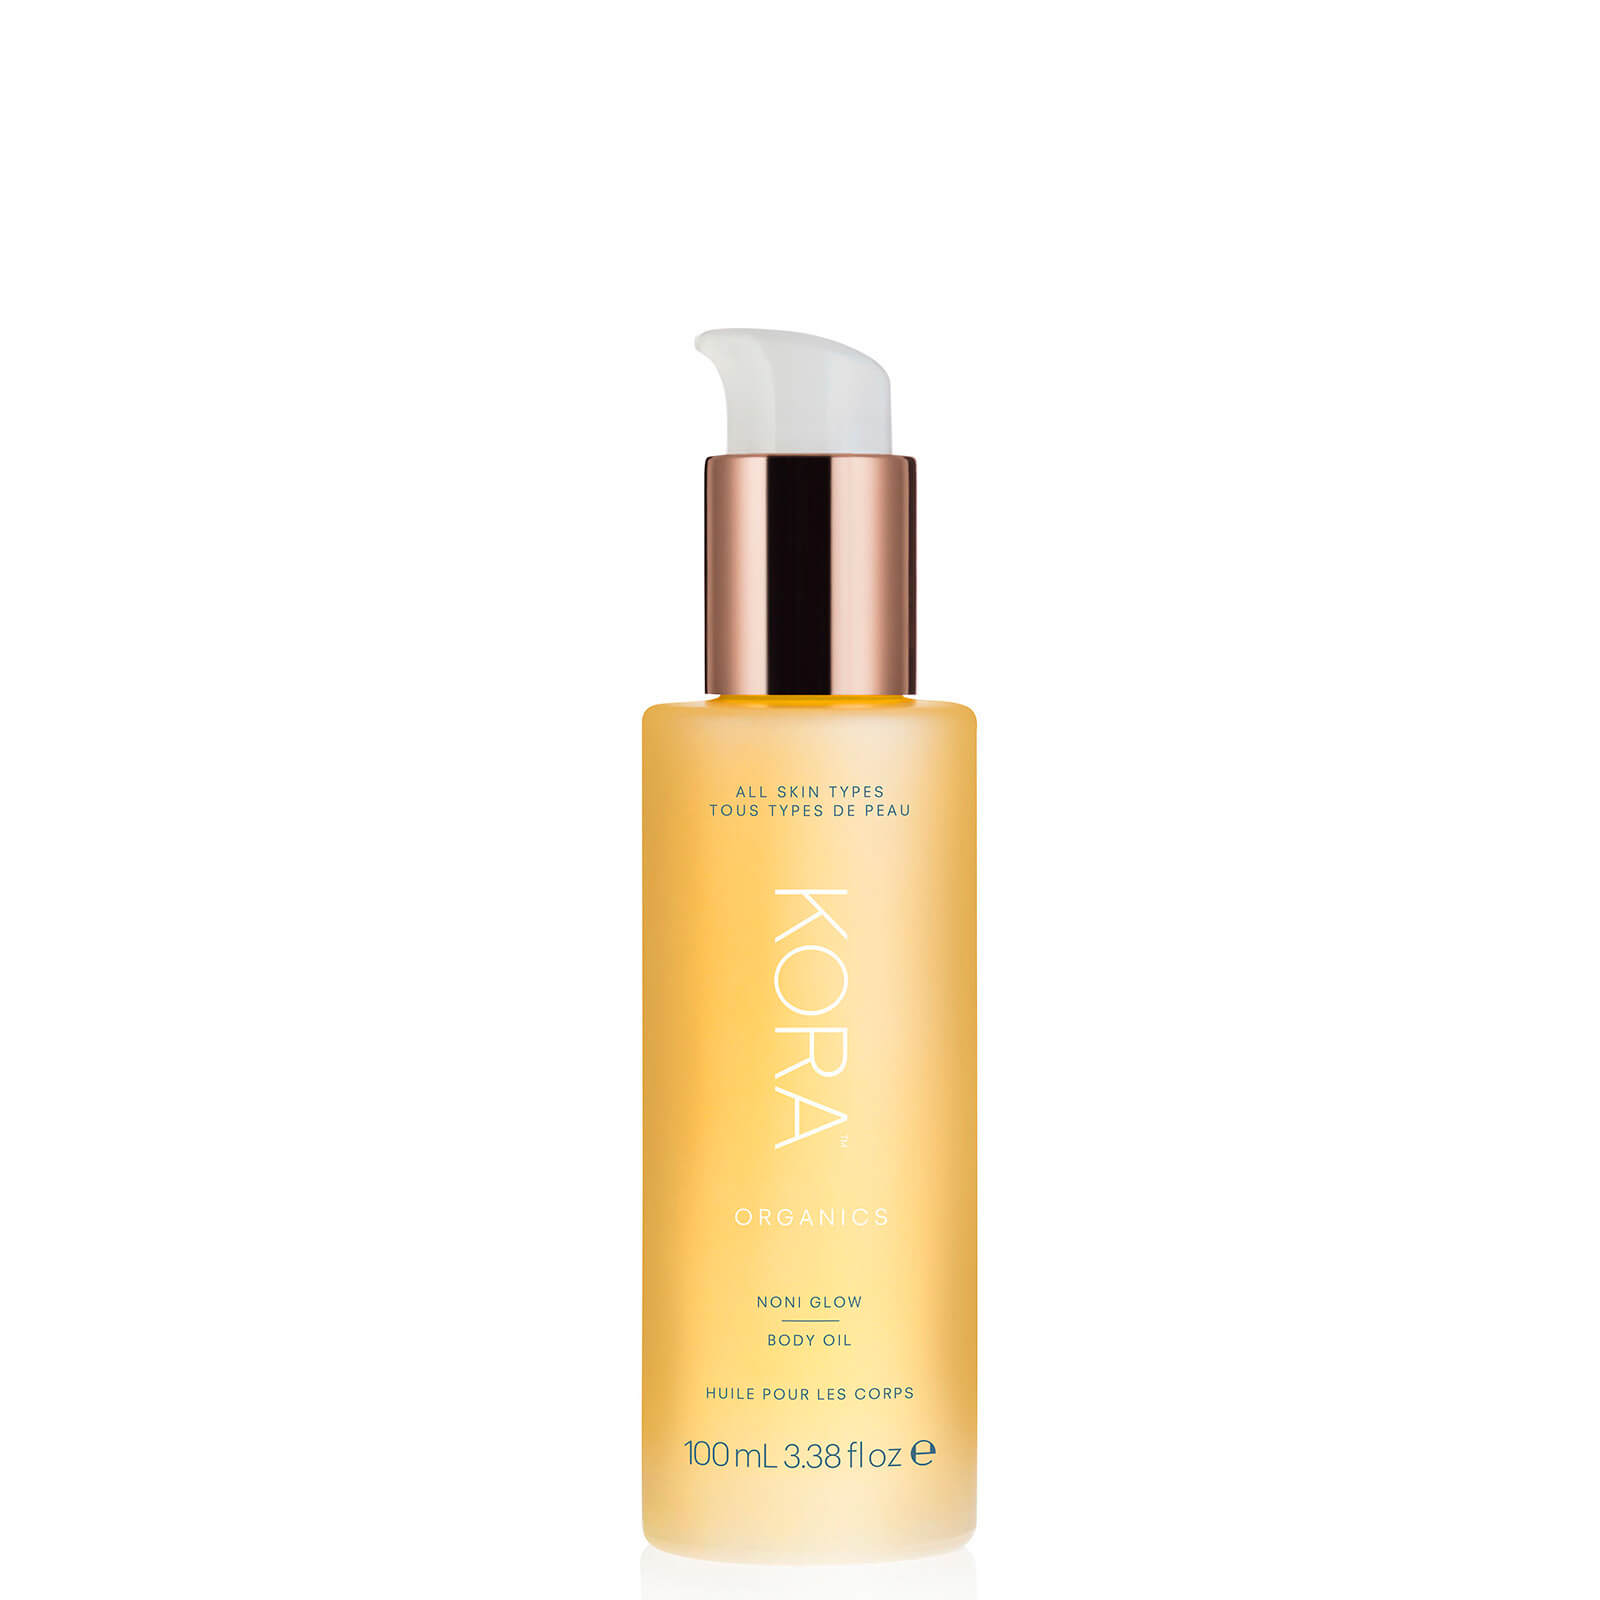 Kora Organics Noni Glow Body Oil 100ml